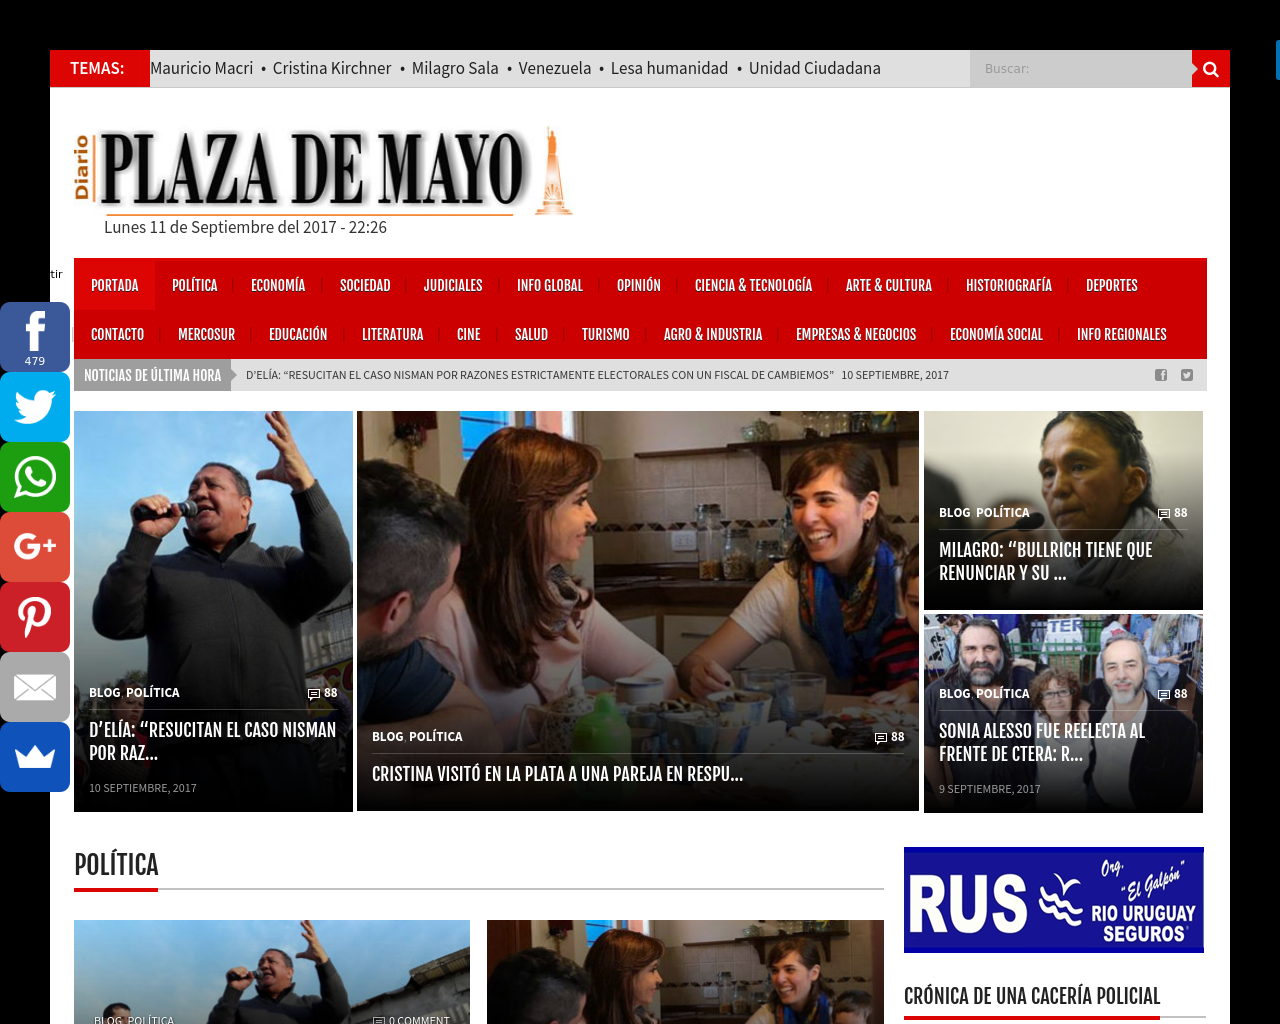 Plaza-De-Mayo-Advertising-Reviews-Pricing